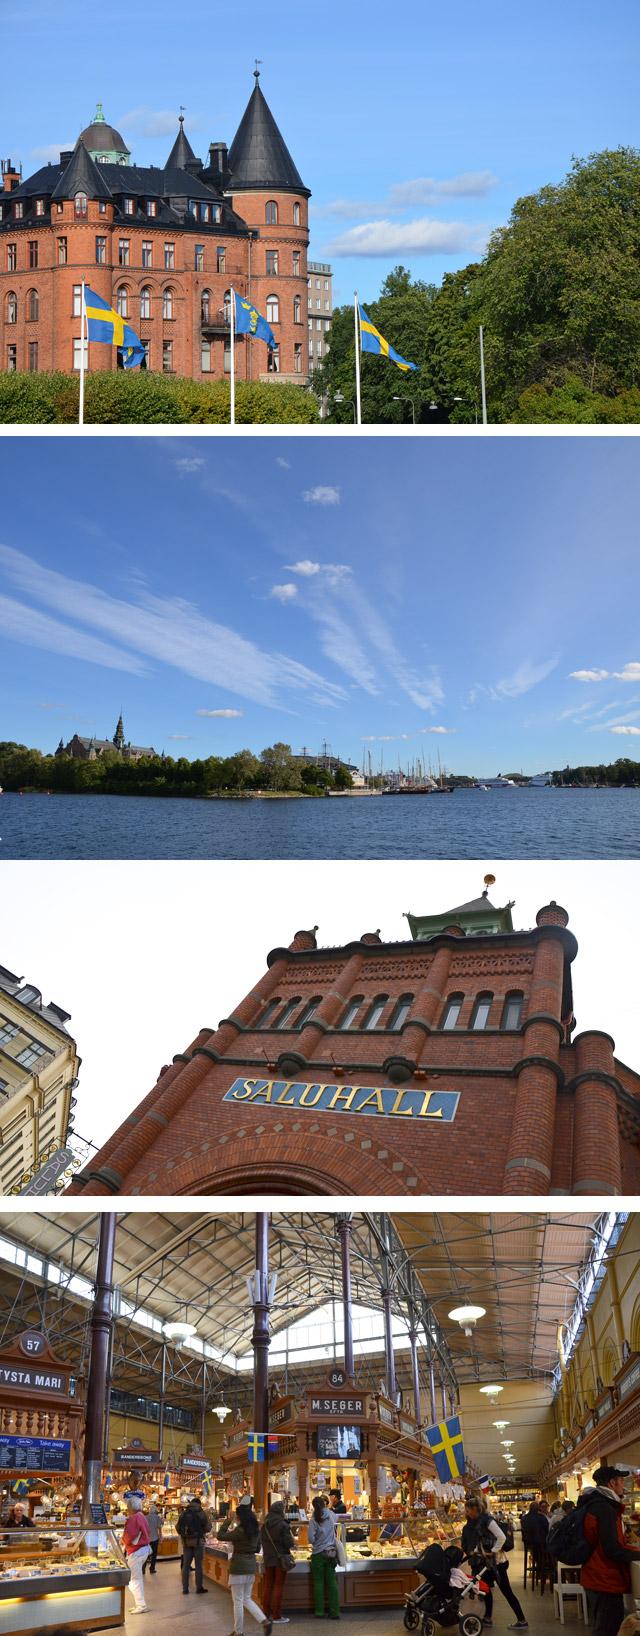 Östermalm - City guide Stockholm